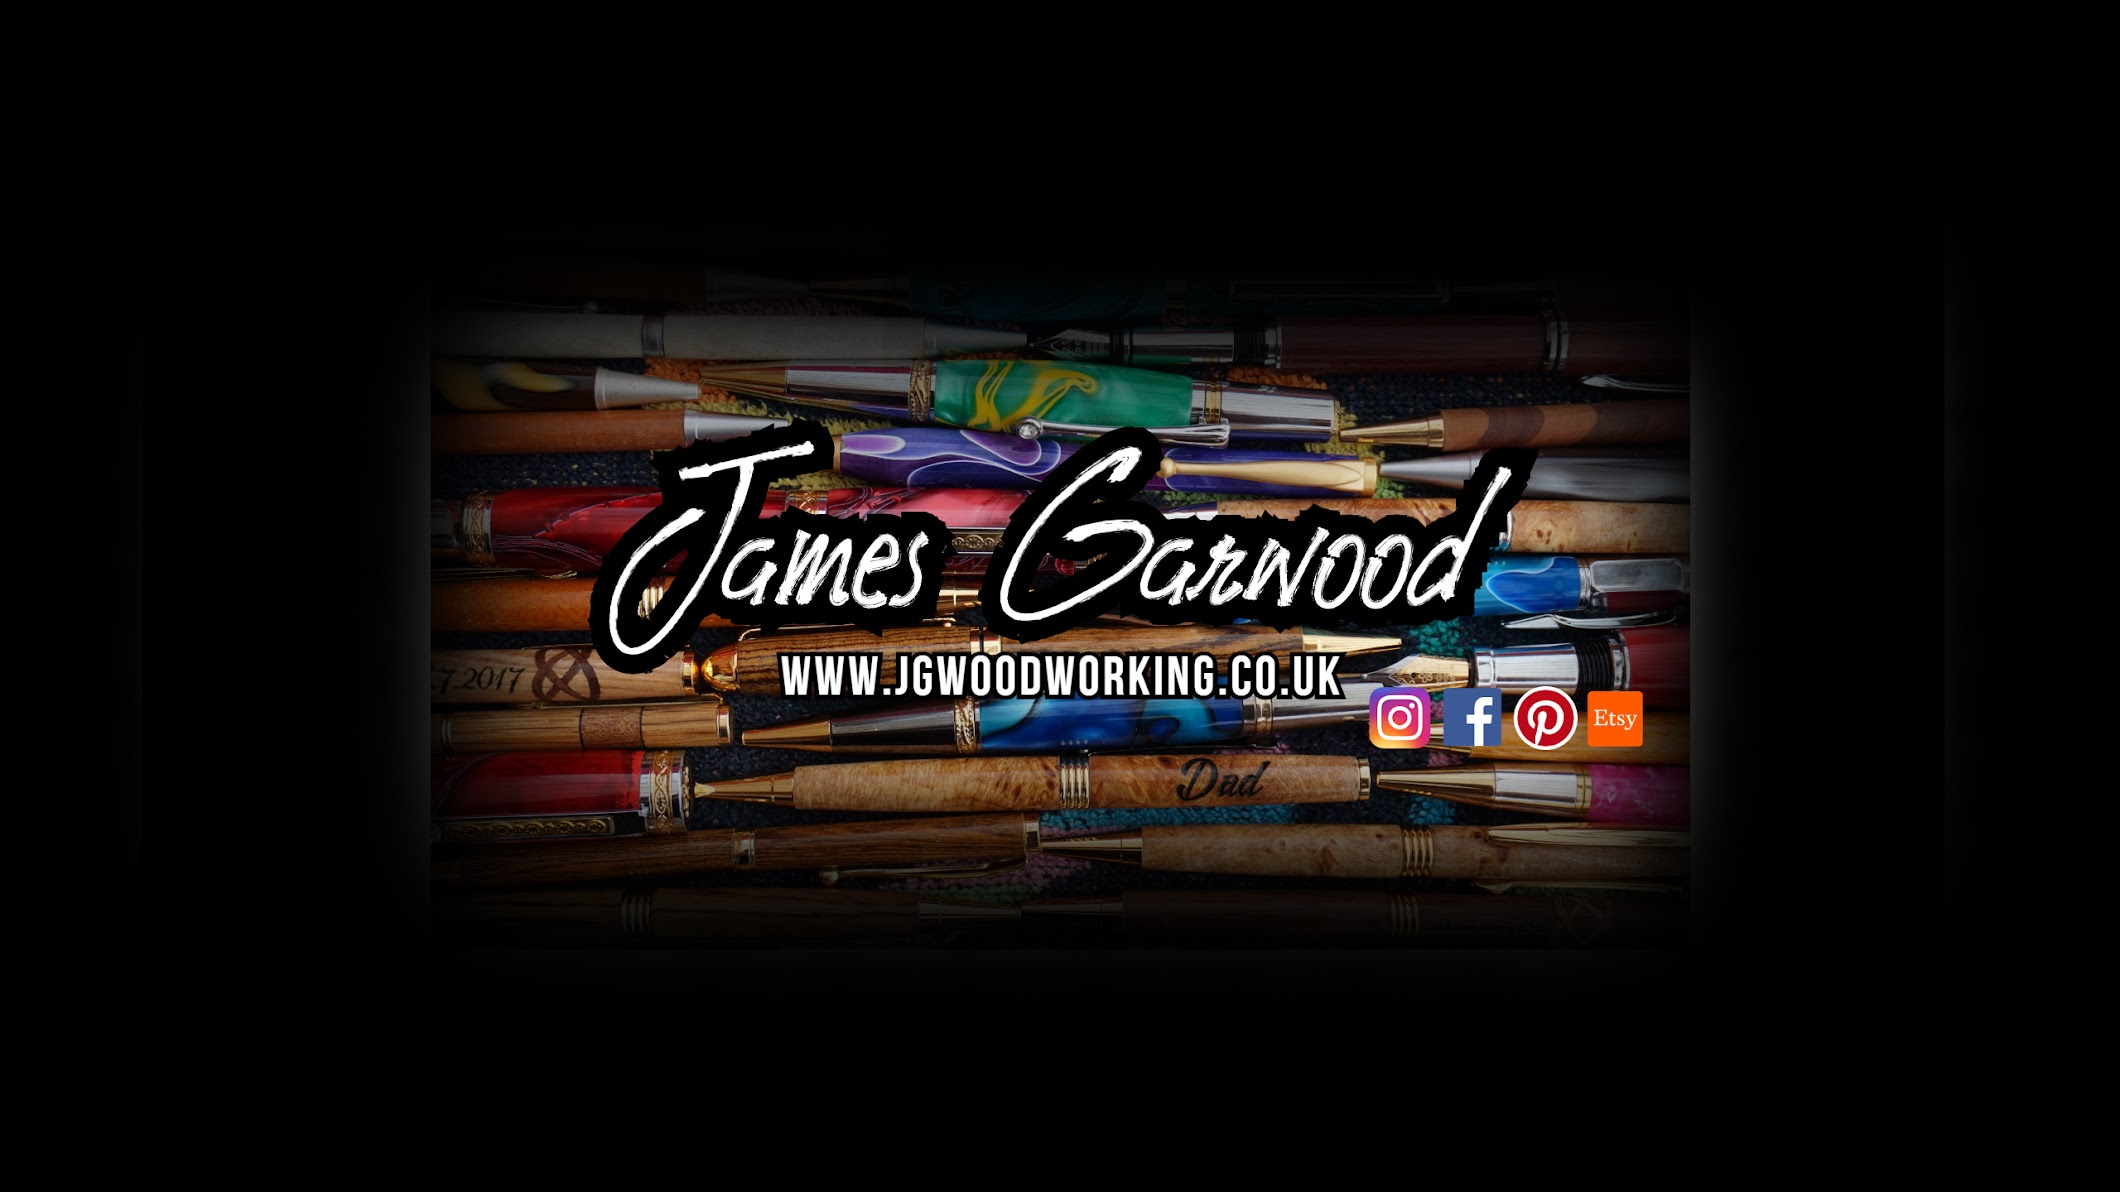 James Garwood